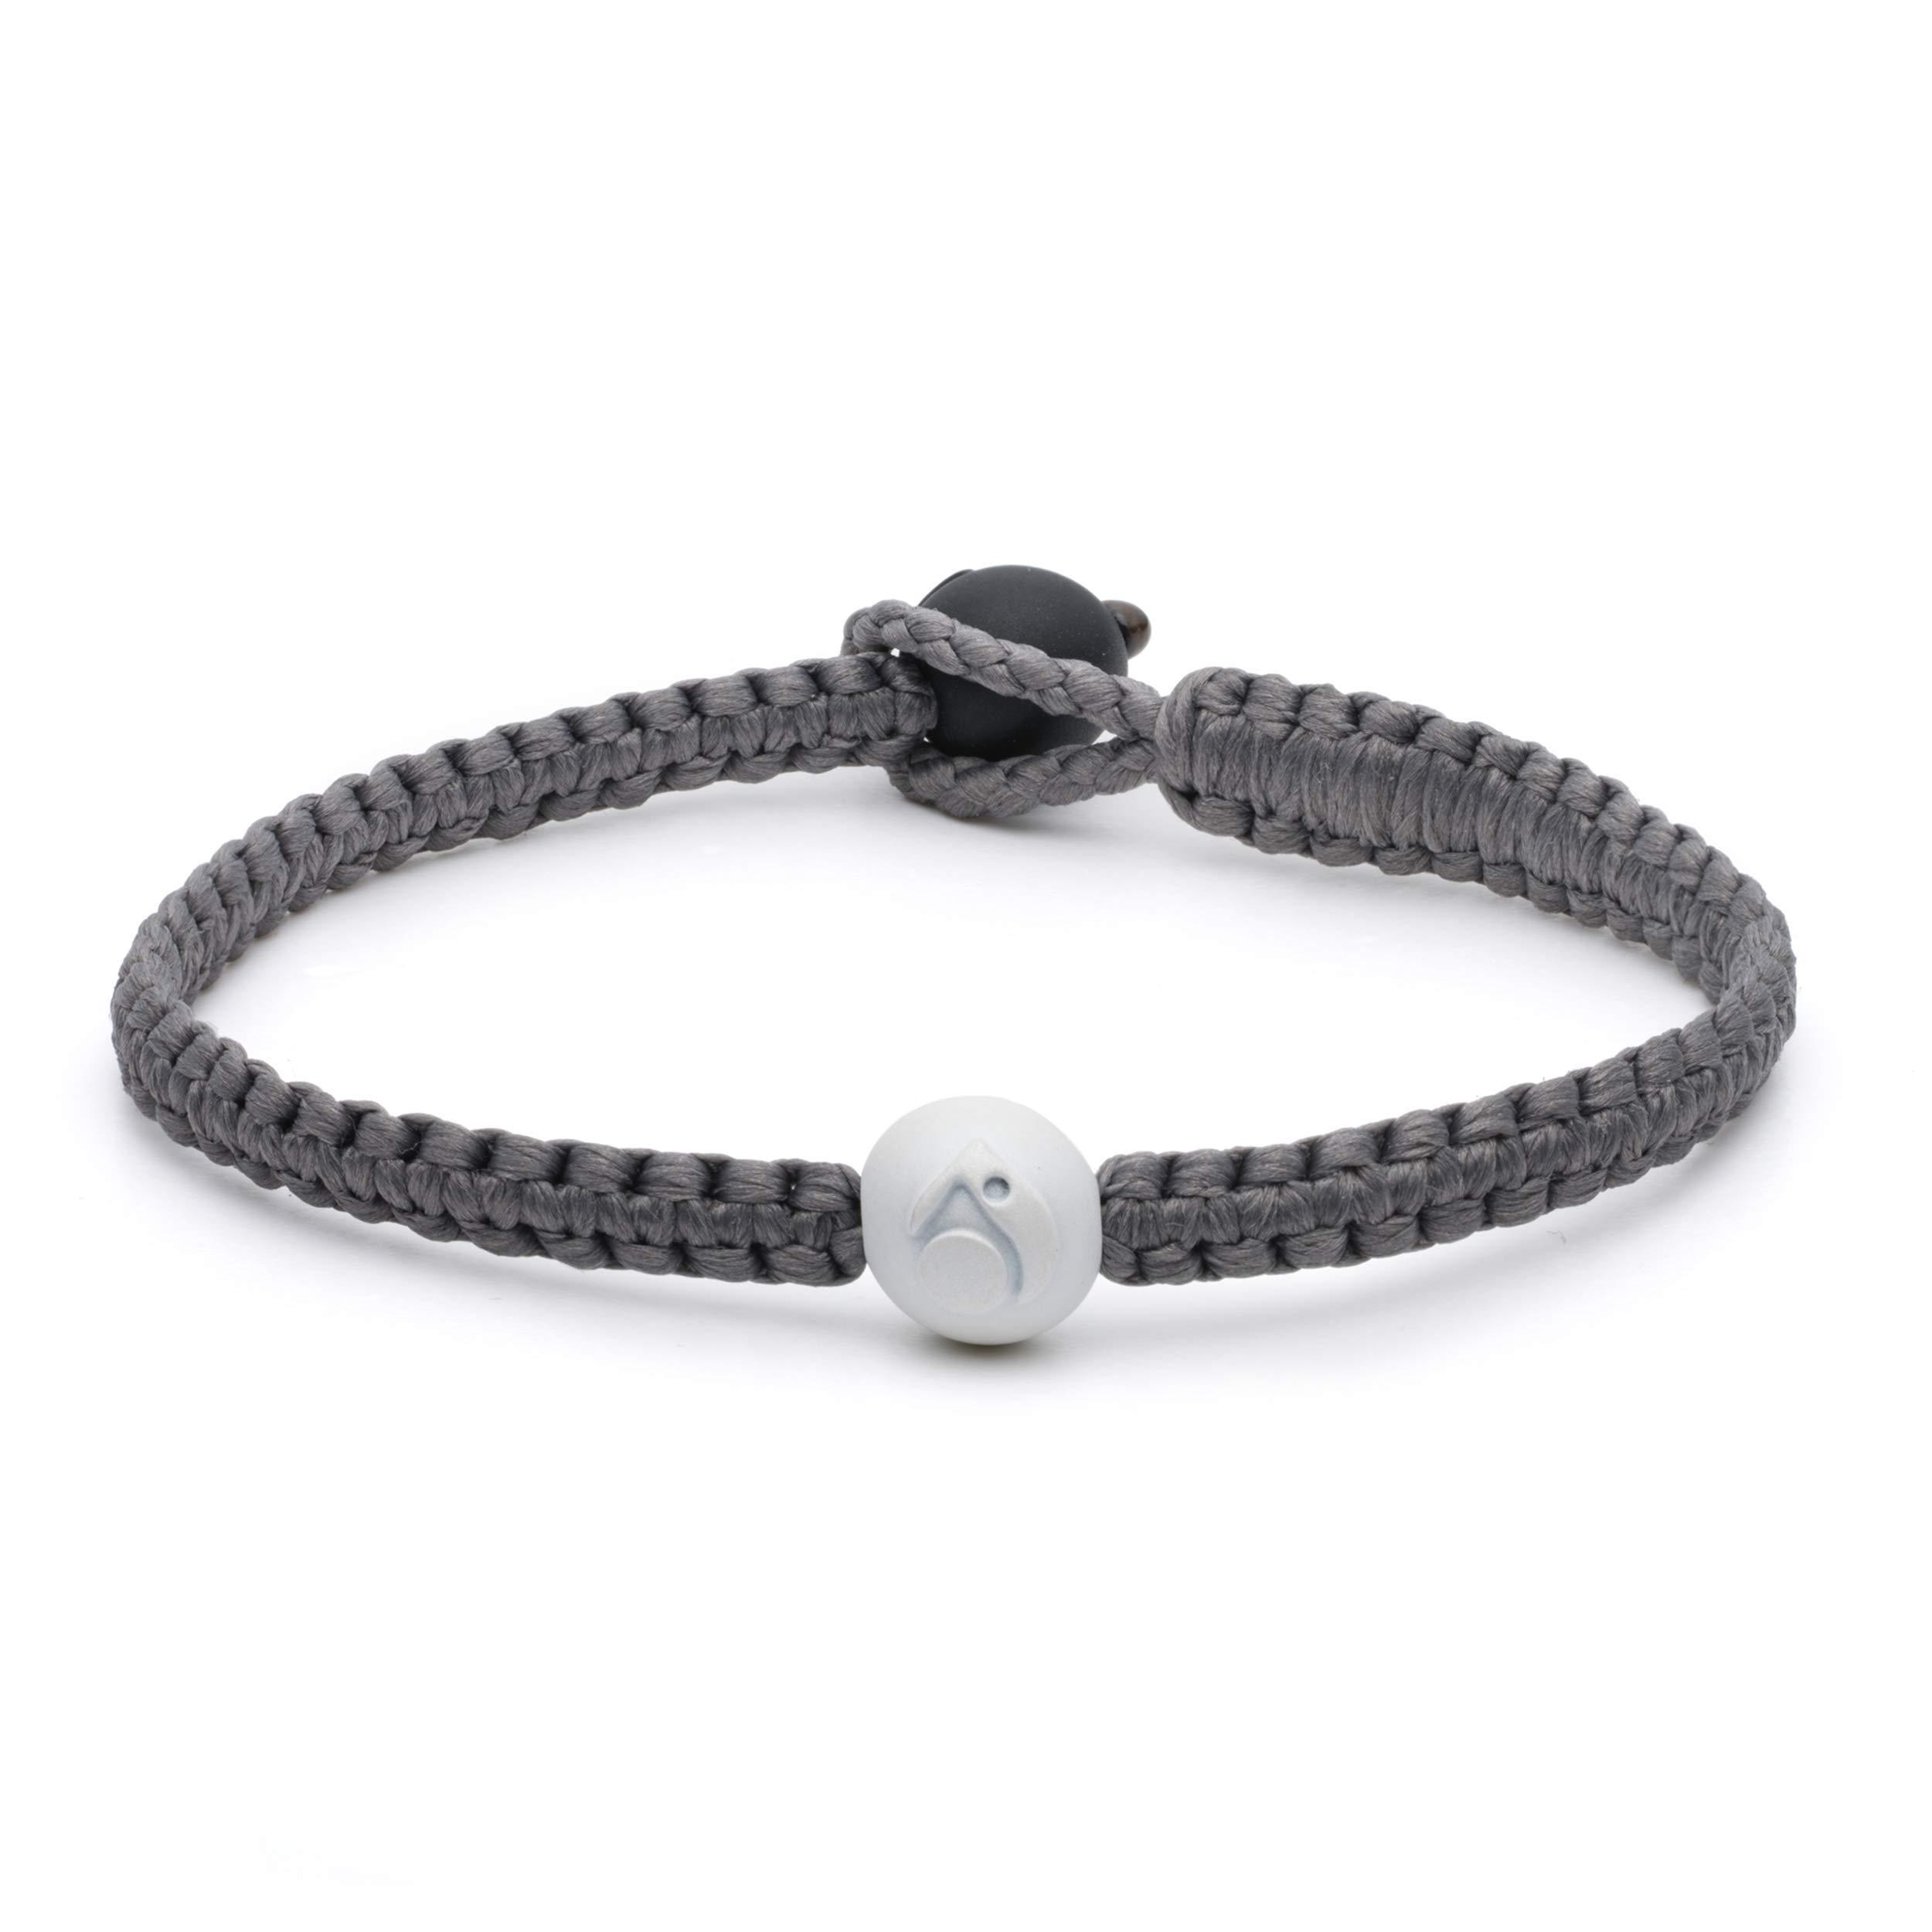 Lokai Silver Single Wrap Bracelet, 6.5'' - Medium